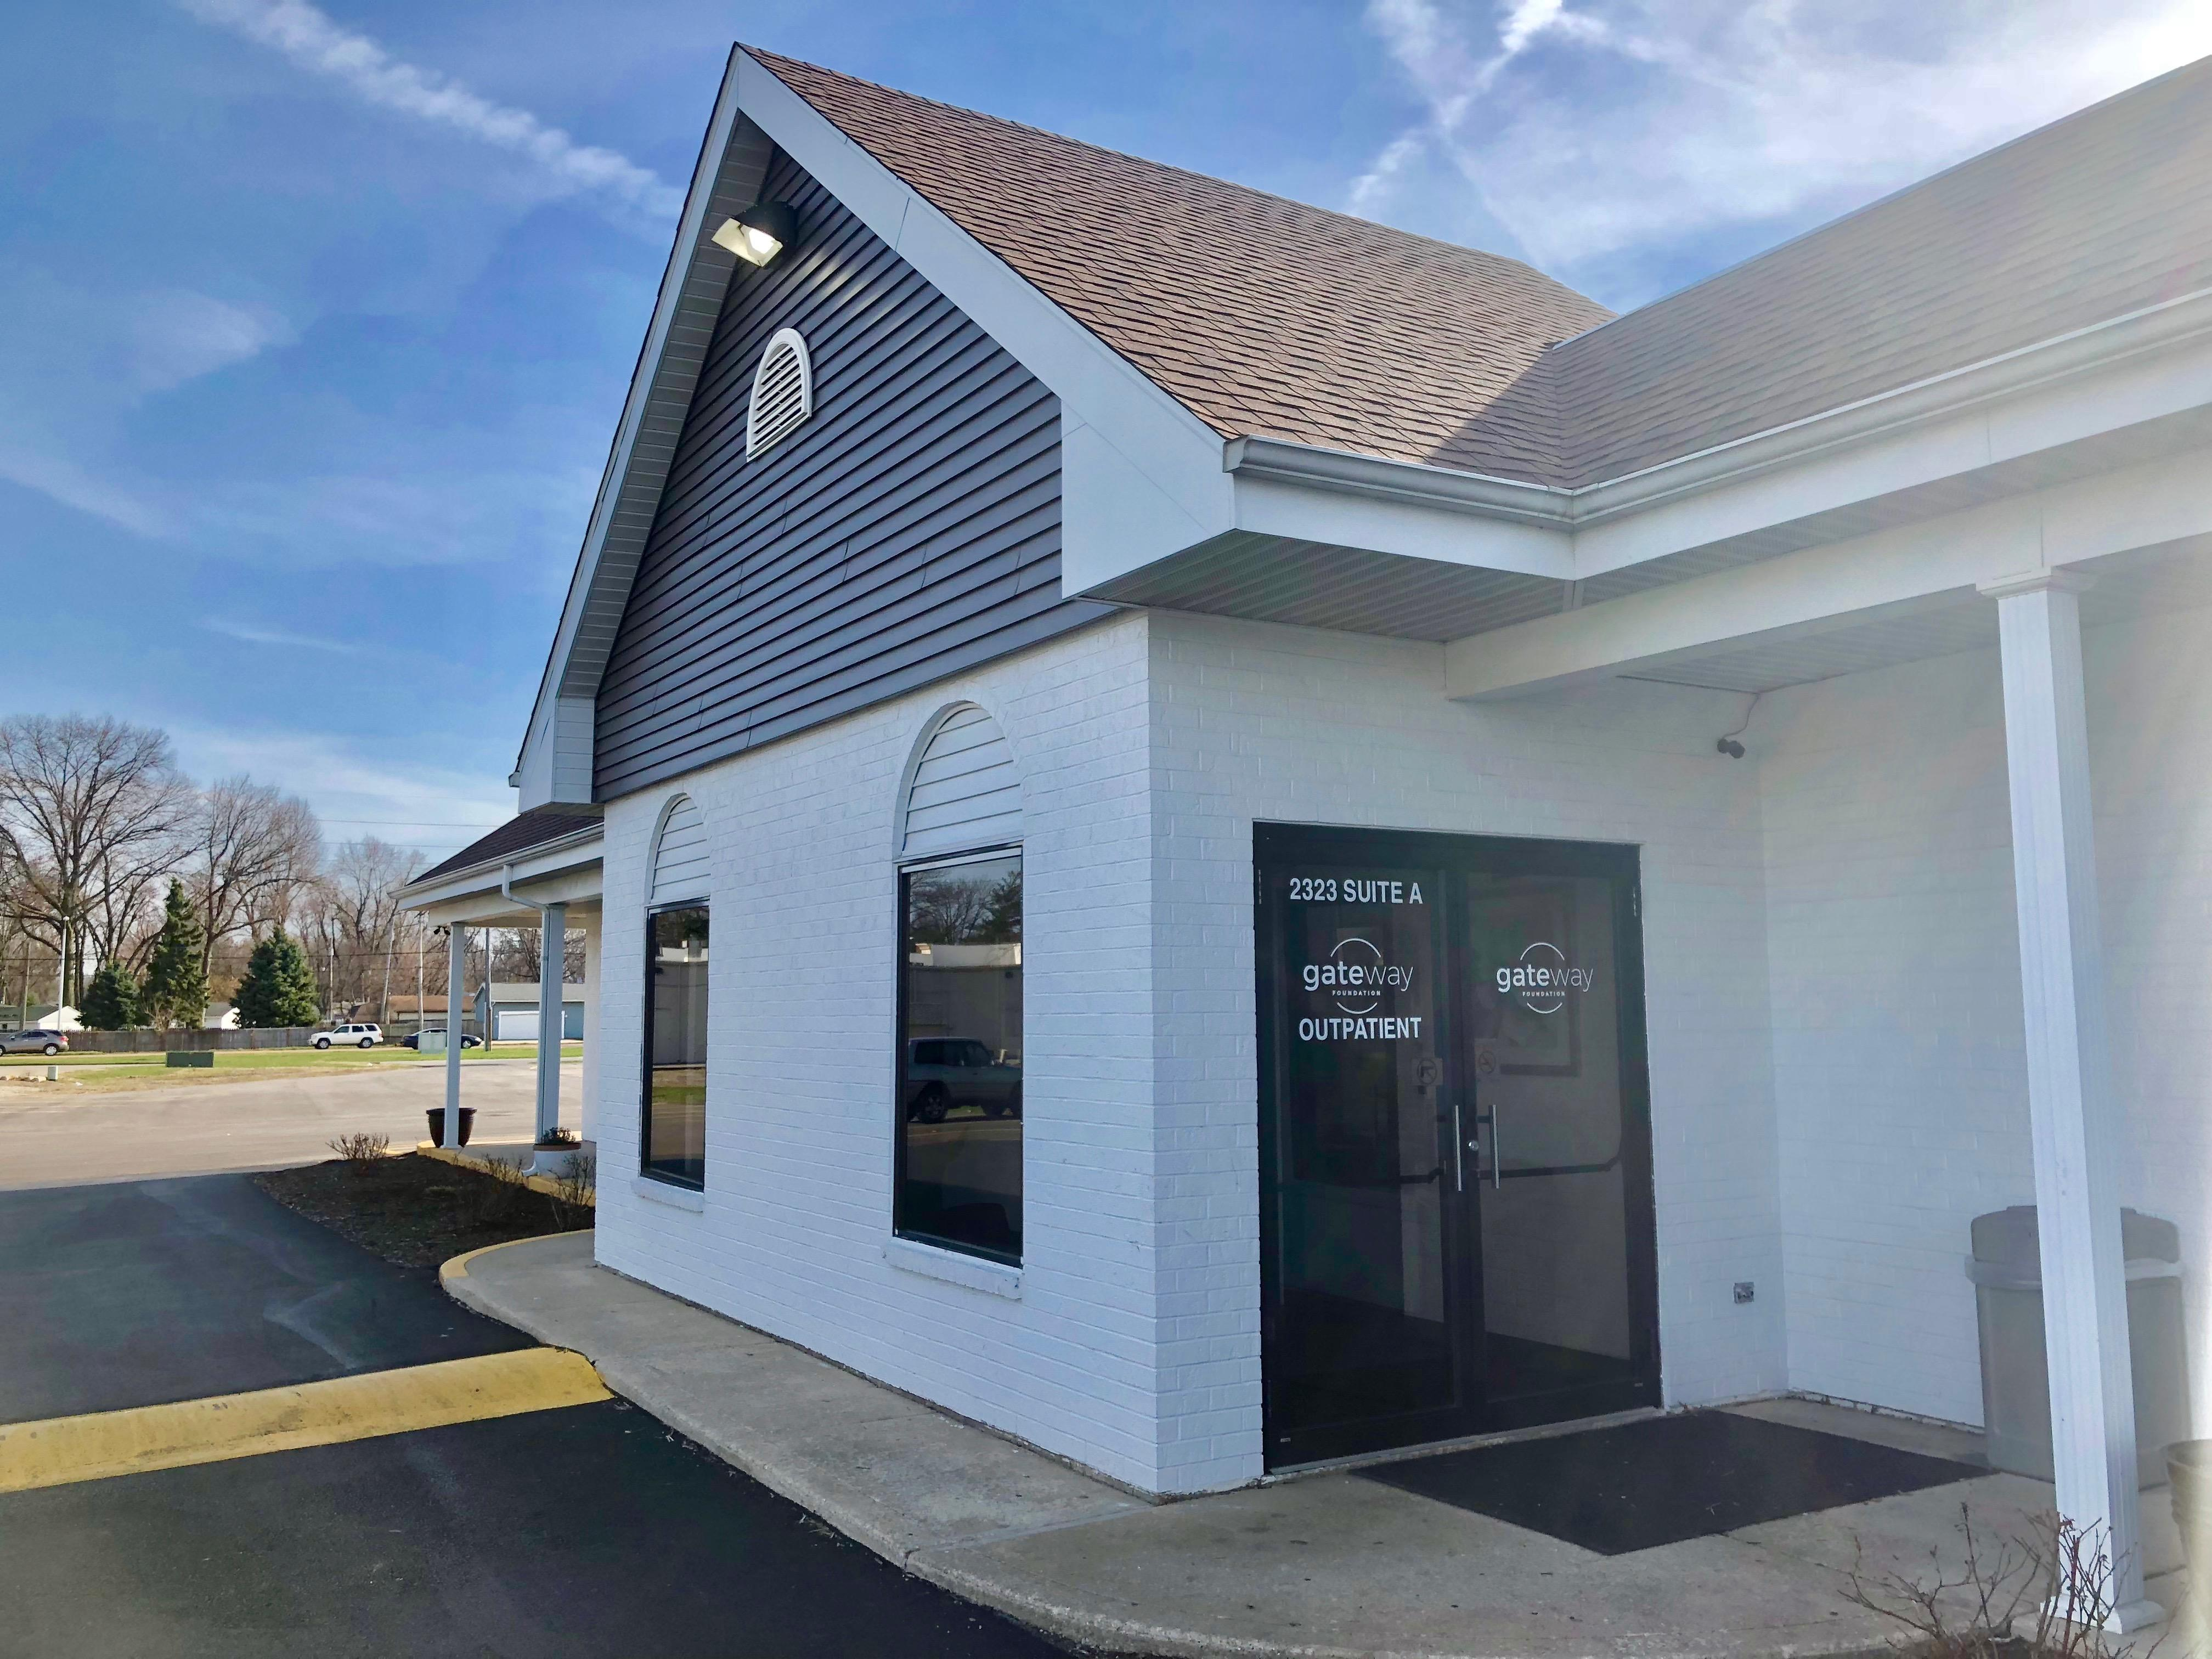 Gateway Foundation Alcohol & Drug Treatment Centers - Springfield Outpatient image 0